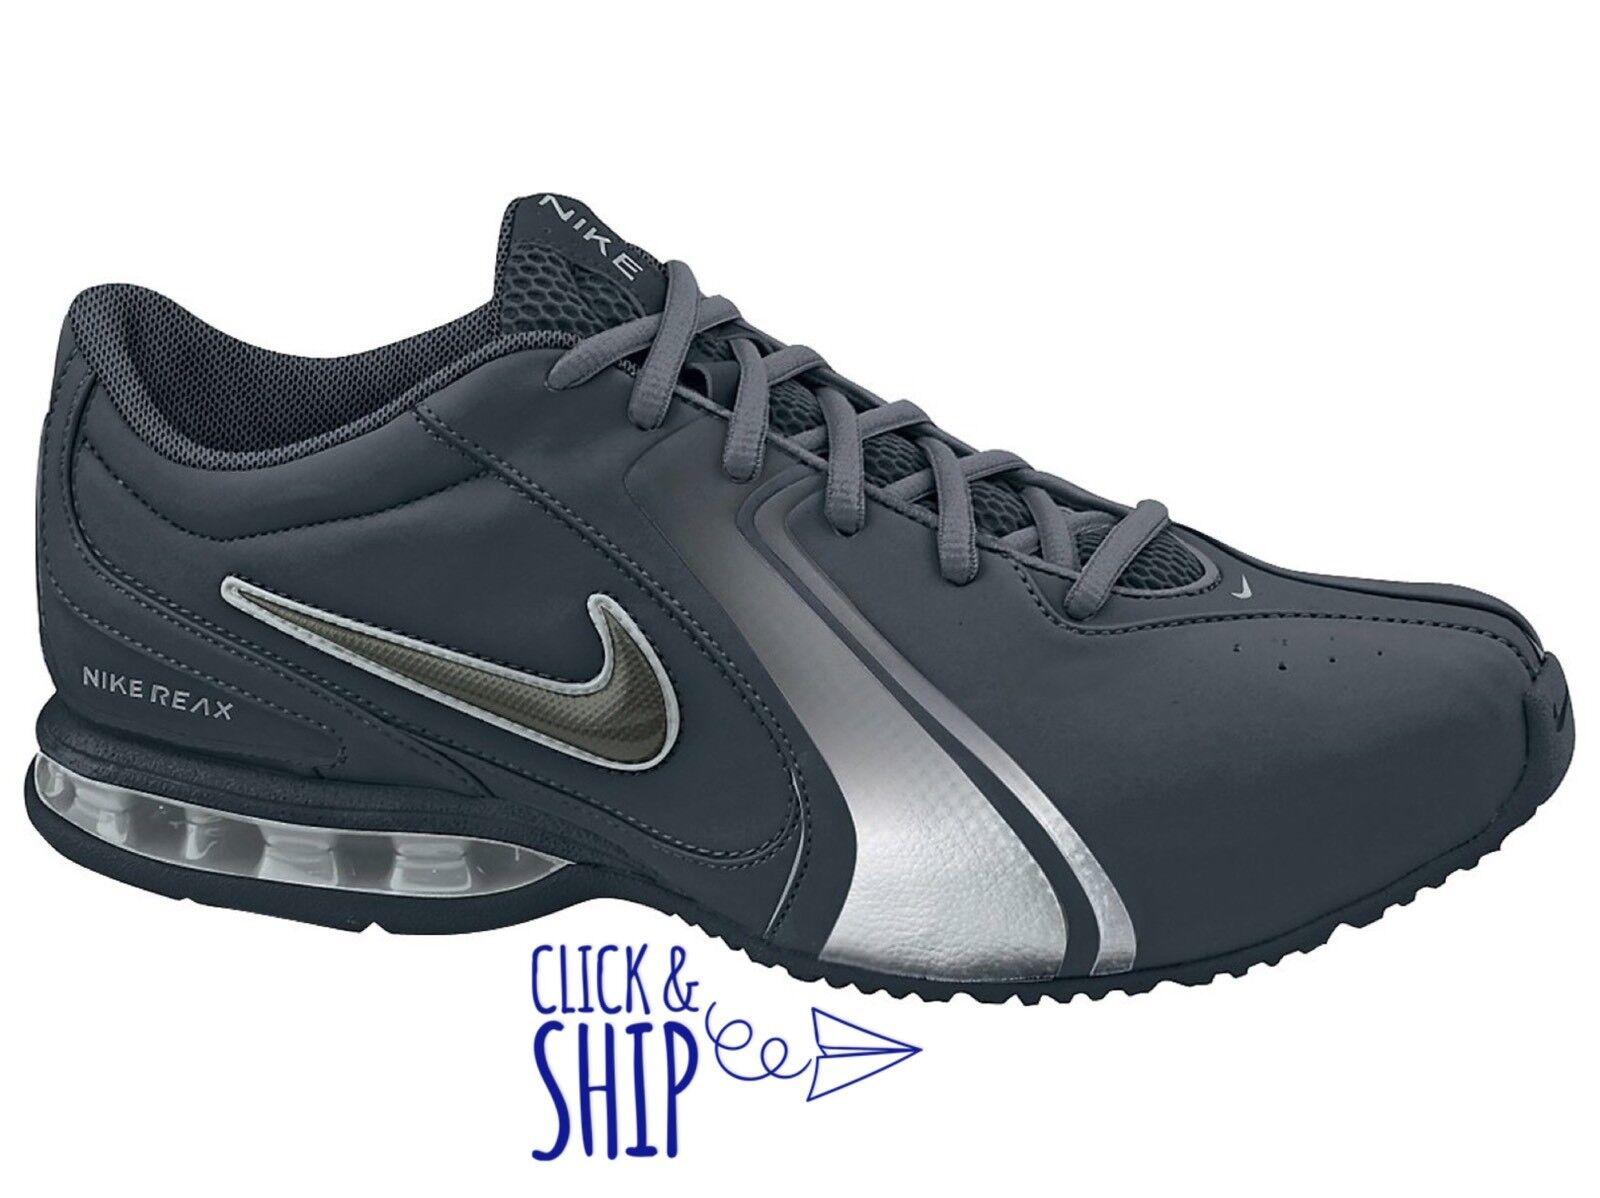 Nike Men's Reax Trainer III 3 SL Training Training Training shoes Sneakers Gym Black Newsprint NEW 672e74